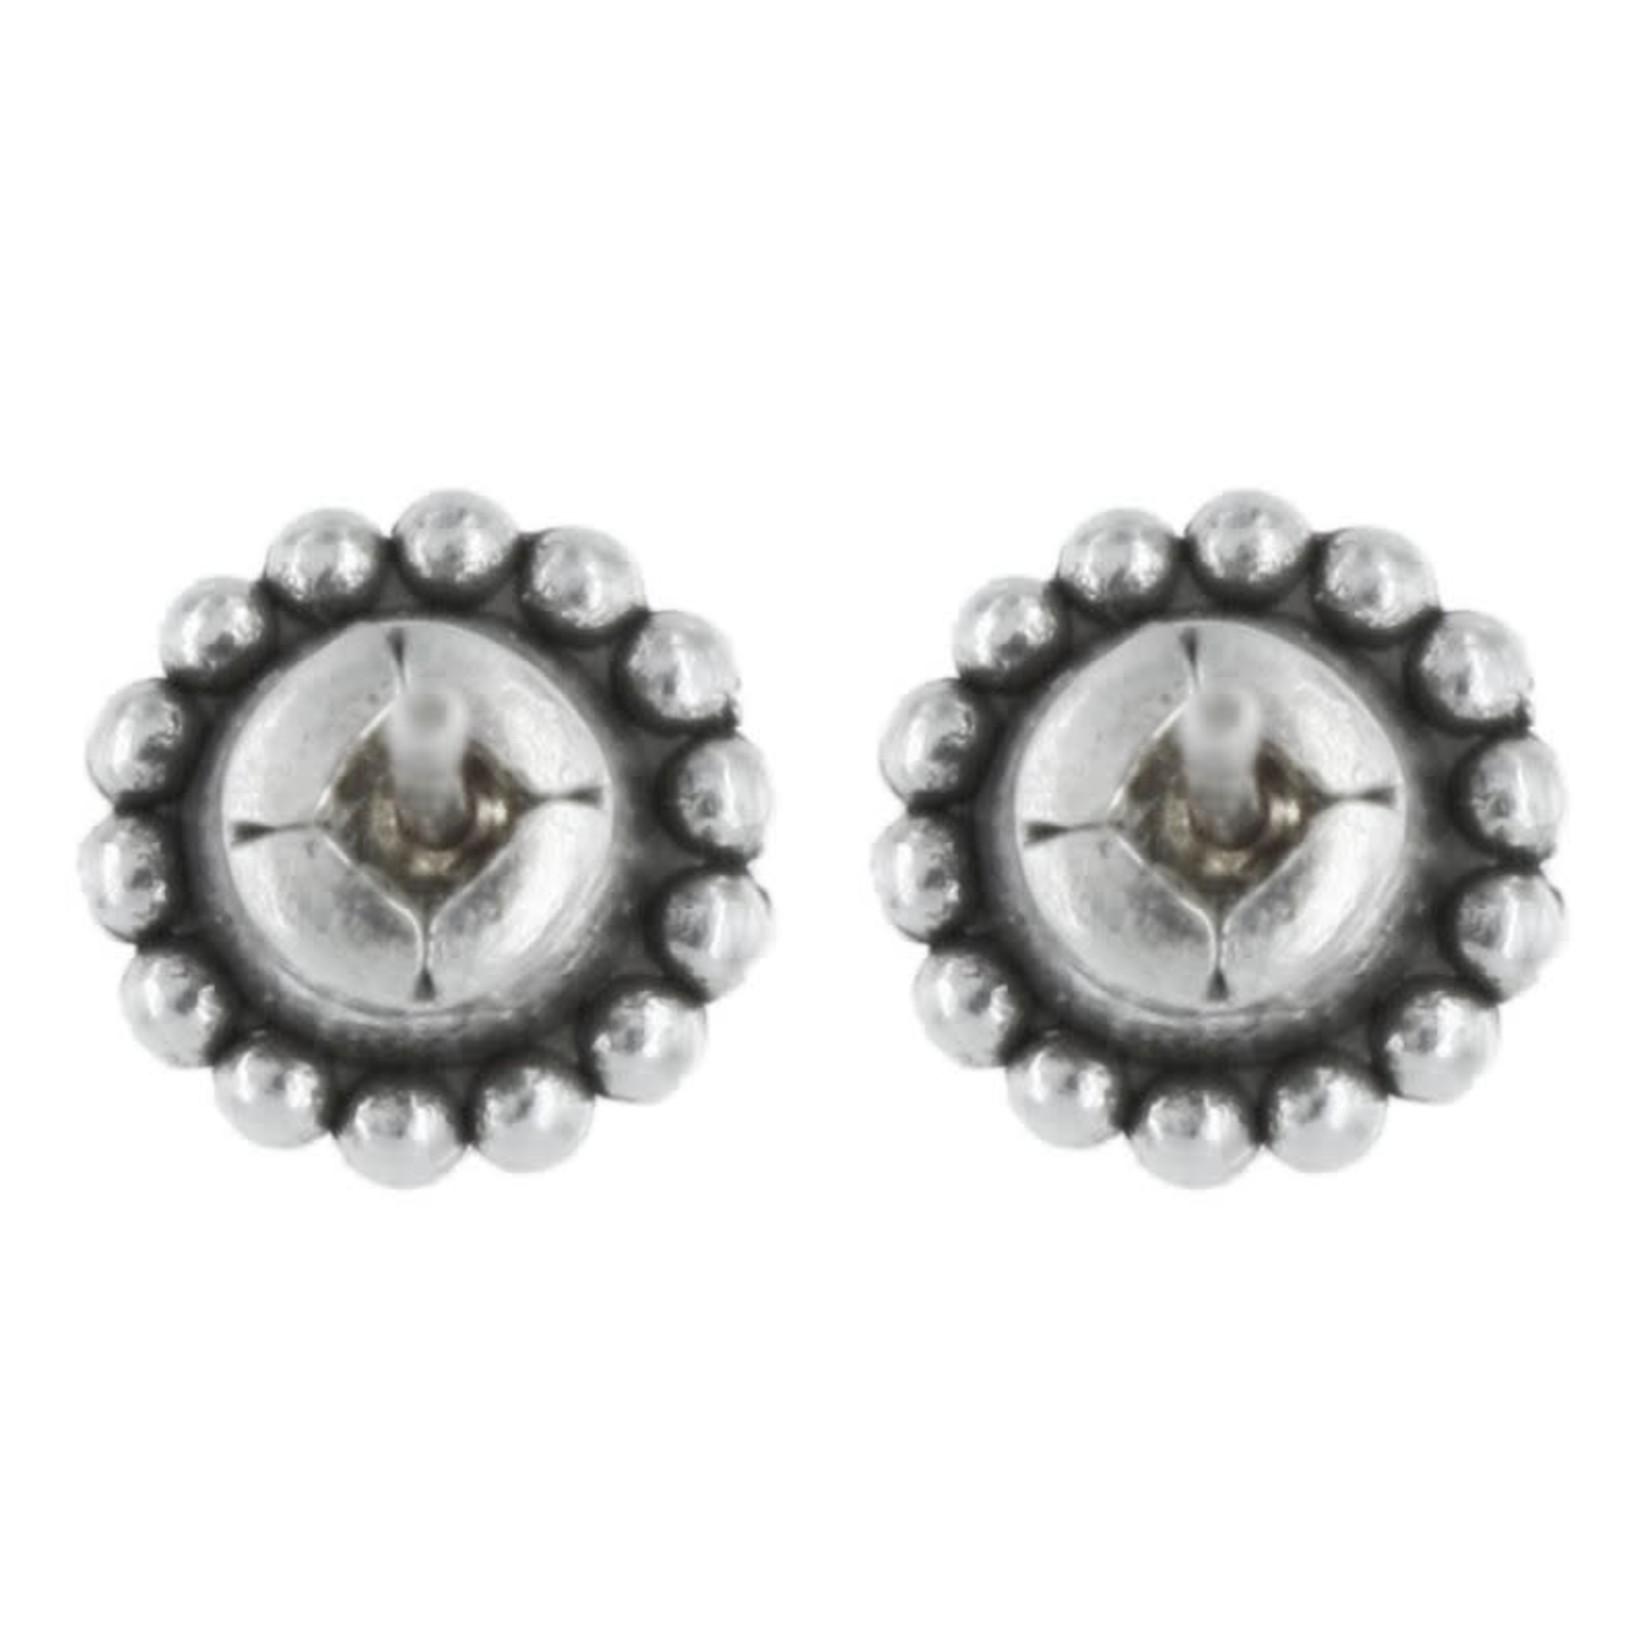 Brighton J20497 Garnet Twinkle Mini Post Earrings